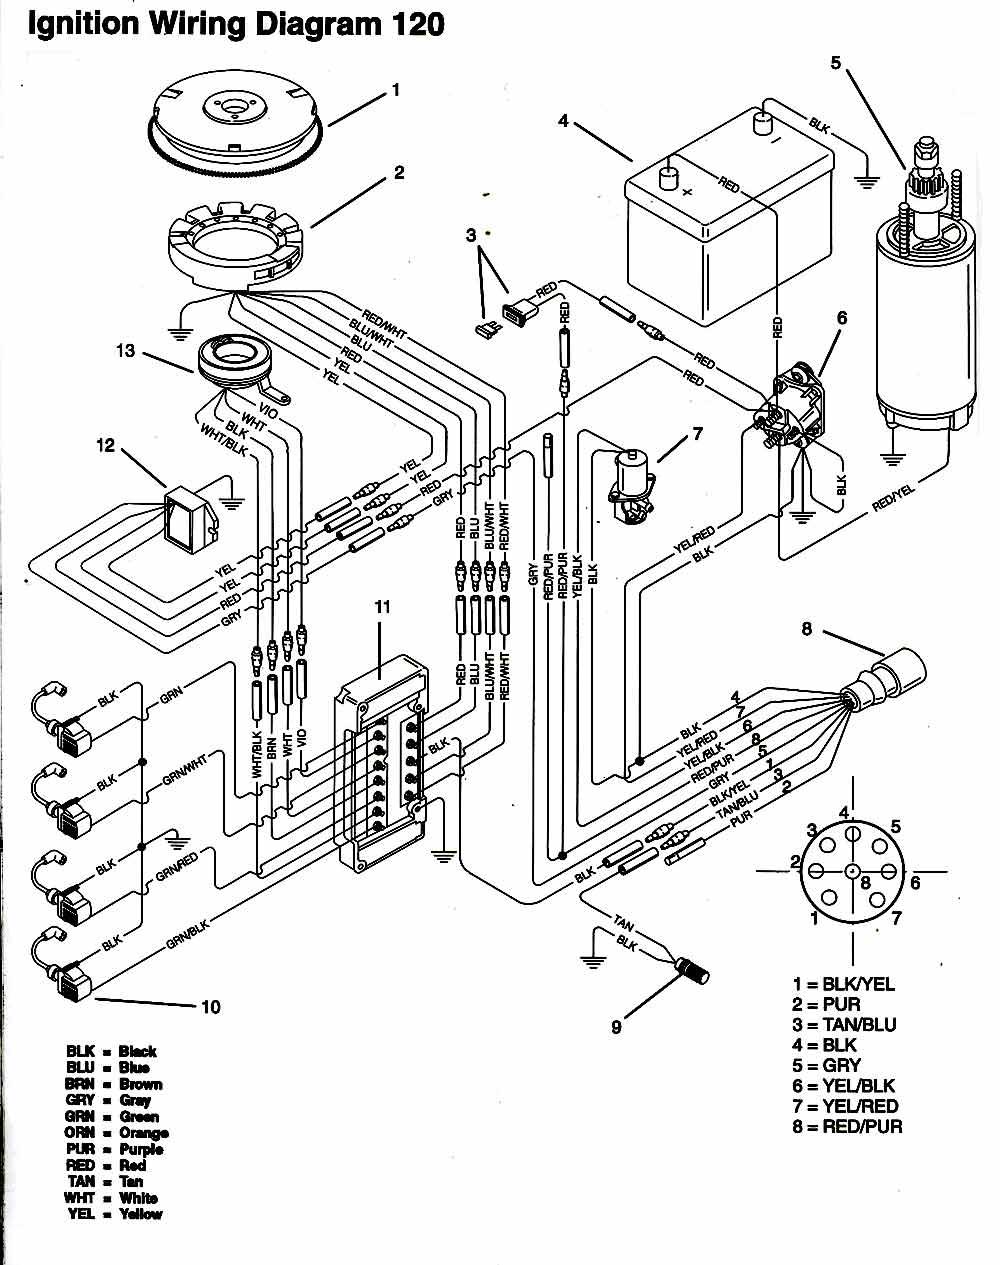 Mercury 115 Hp Wiring Diagram Just Wirings 99 Yamaha Outboard 1999 Schematics Rh Enr Green Com 1989 80